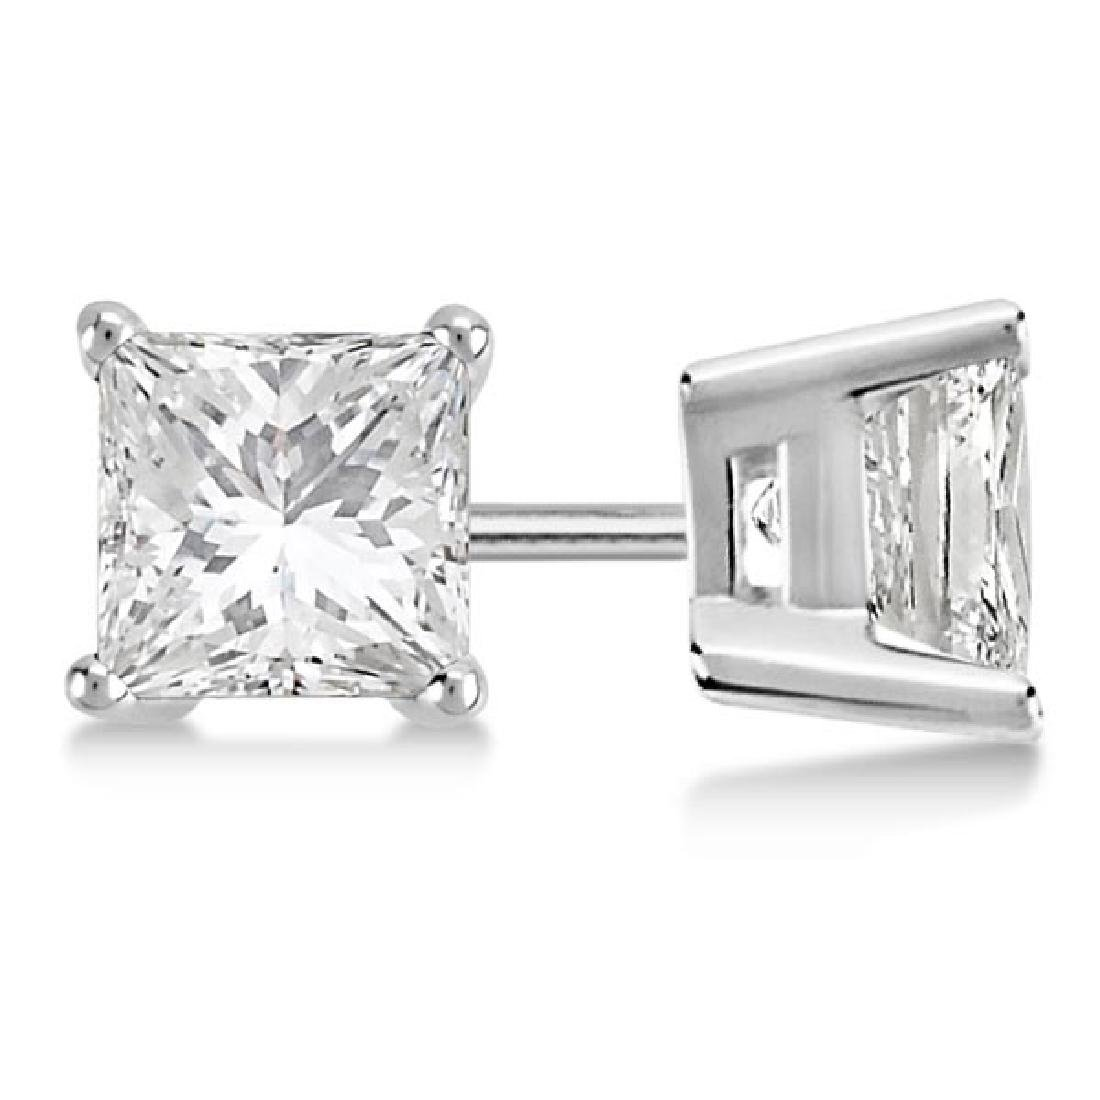 Certified 1.02 CTW Princess Diamond Stud Earrings J/SI2